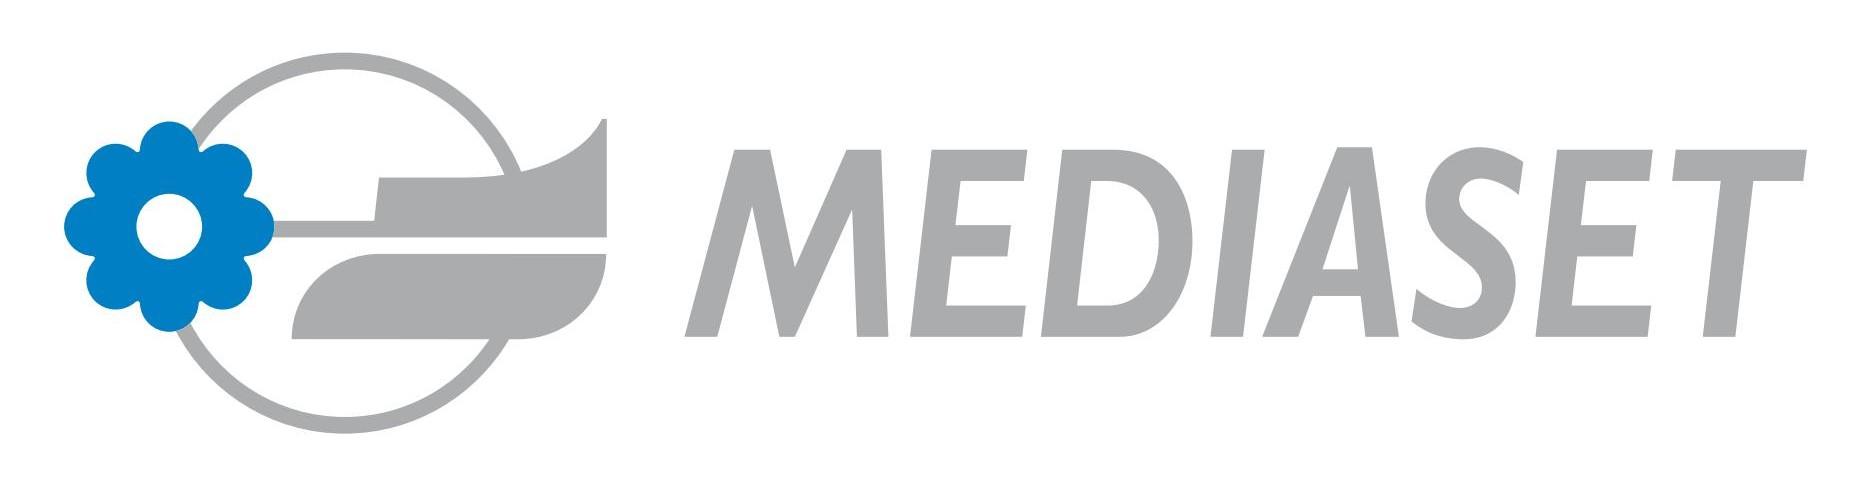 Mediaset SpA logo